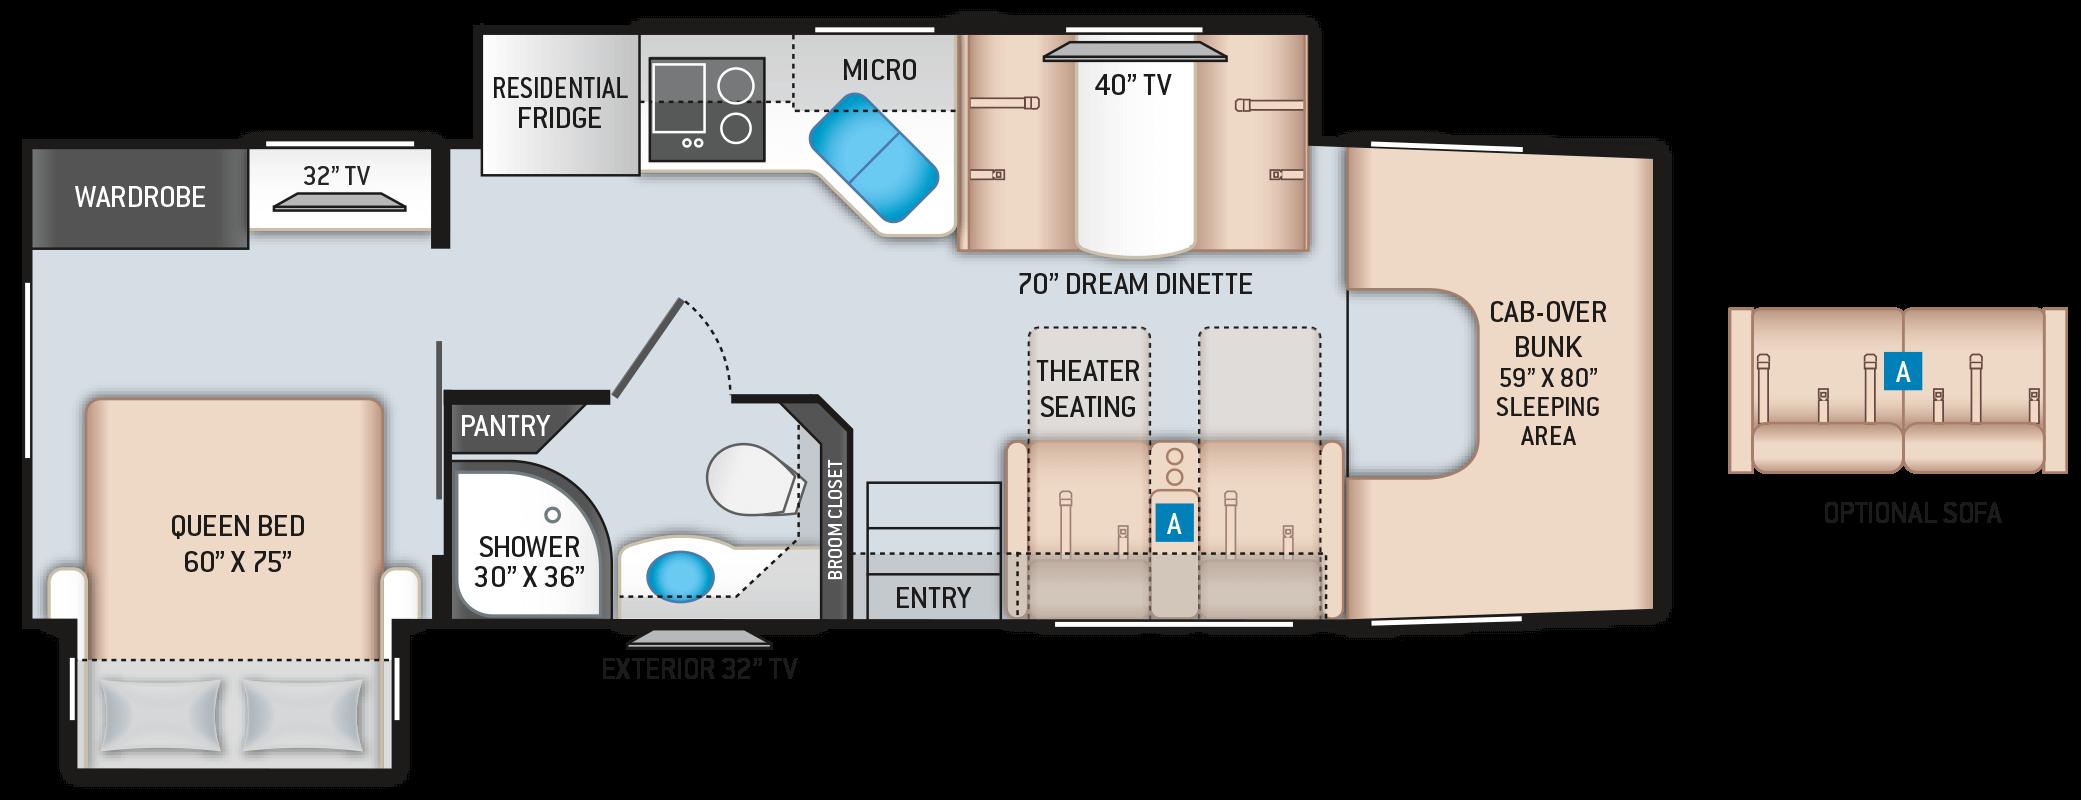 2020-Magnitude-XG32-Floor-Plan